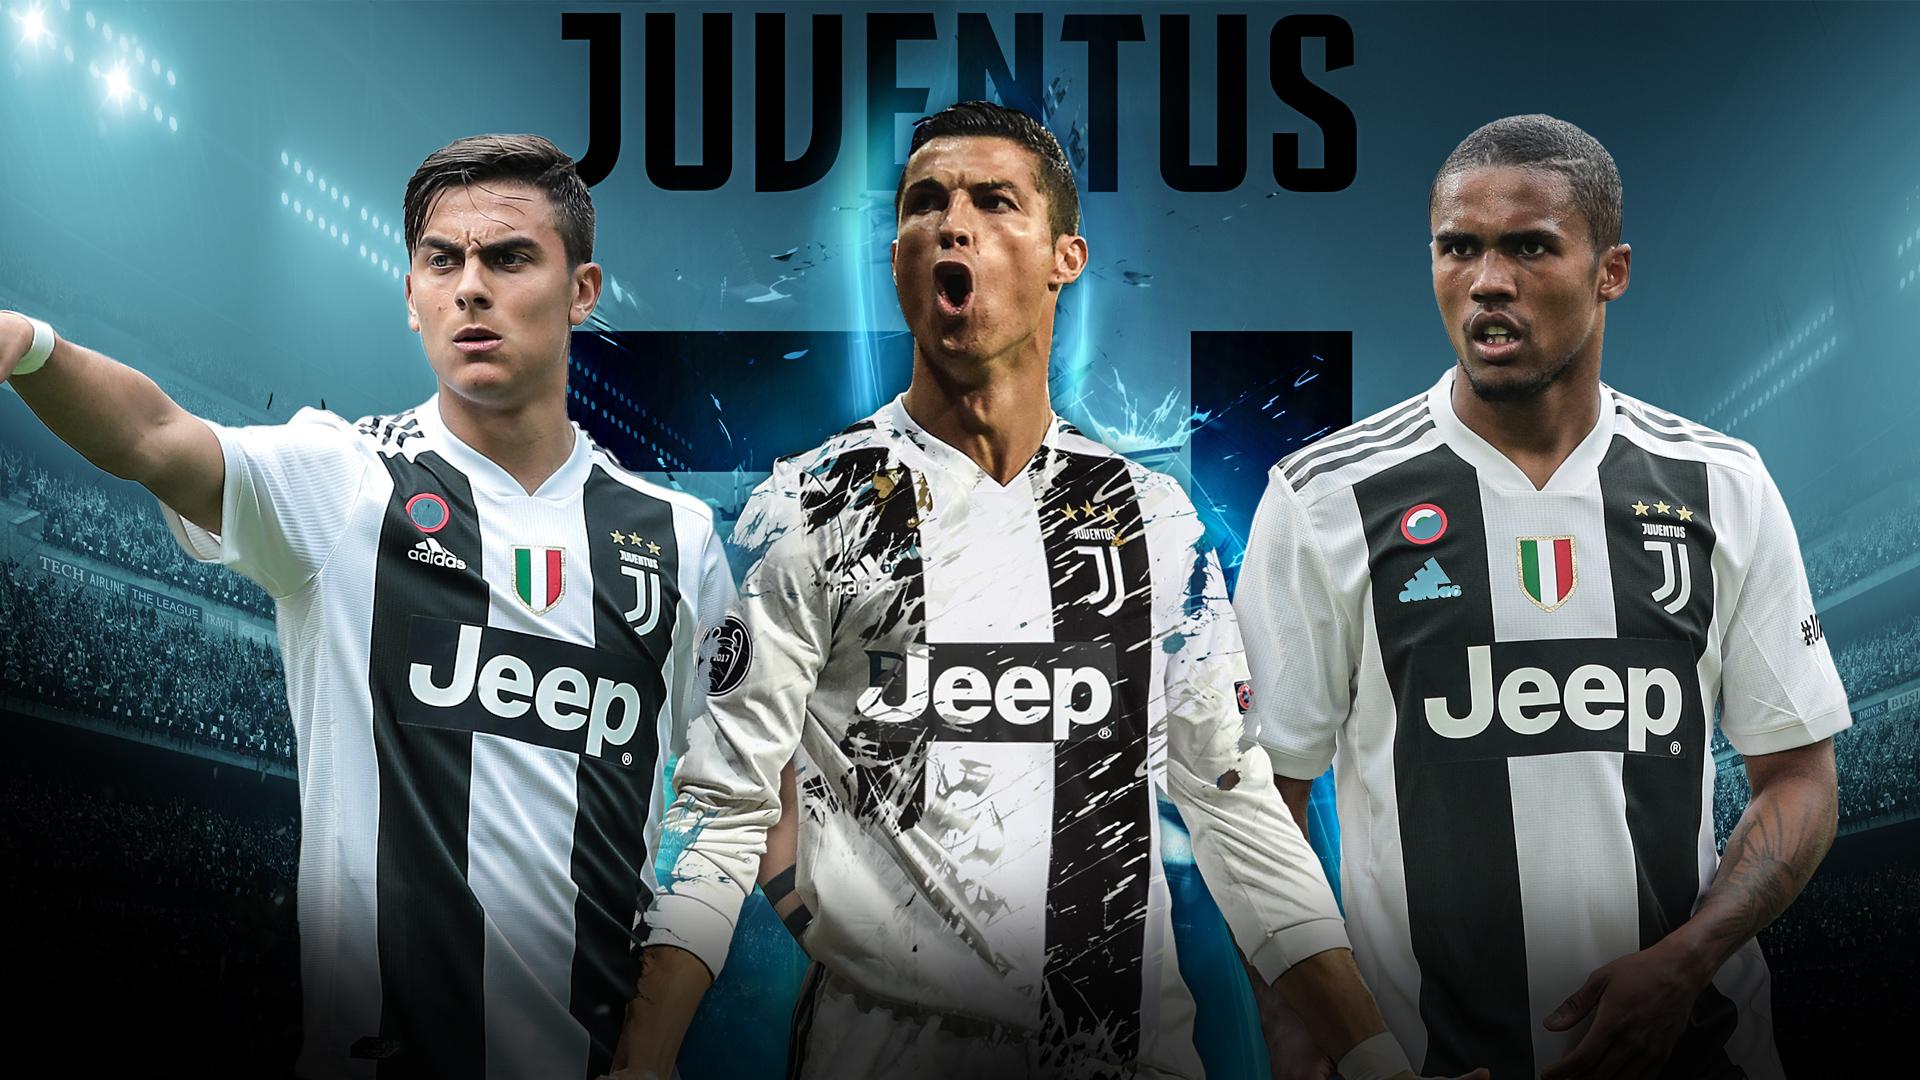 Juventus Turin Das Ist Das Neue Team Von Cristiano Ronaldo